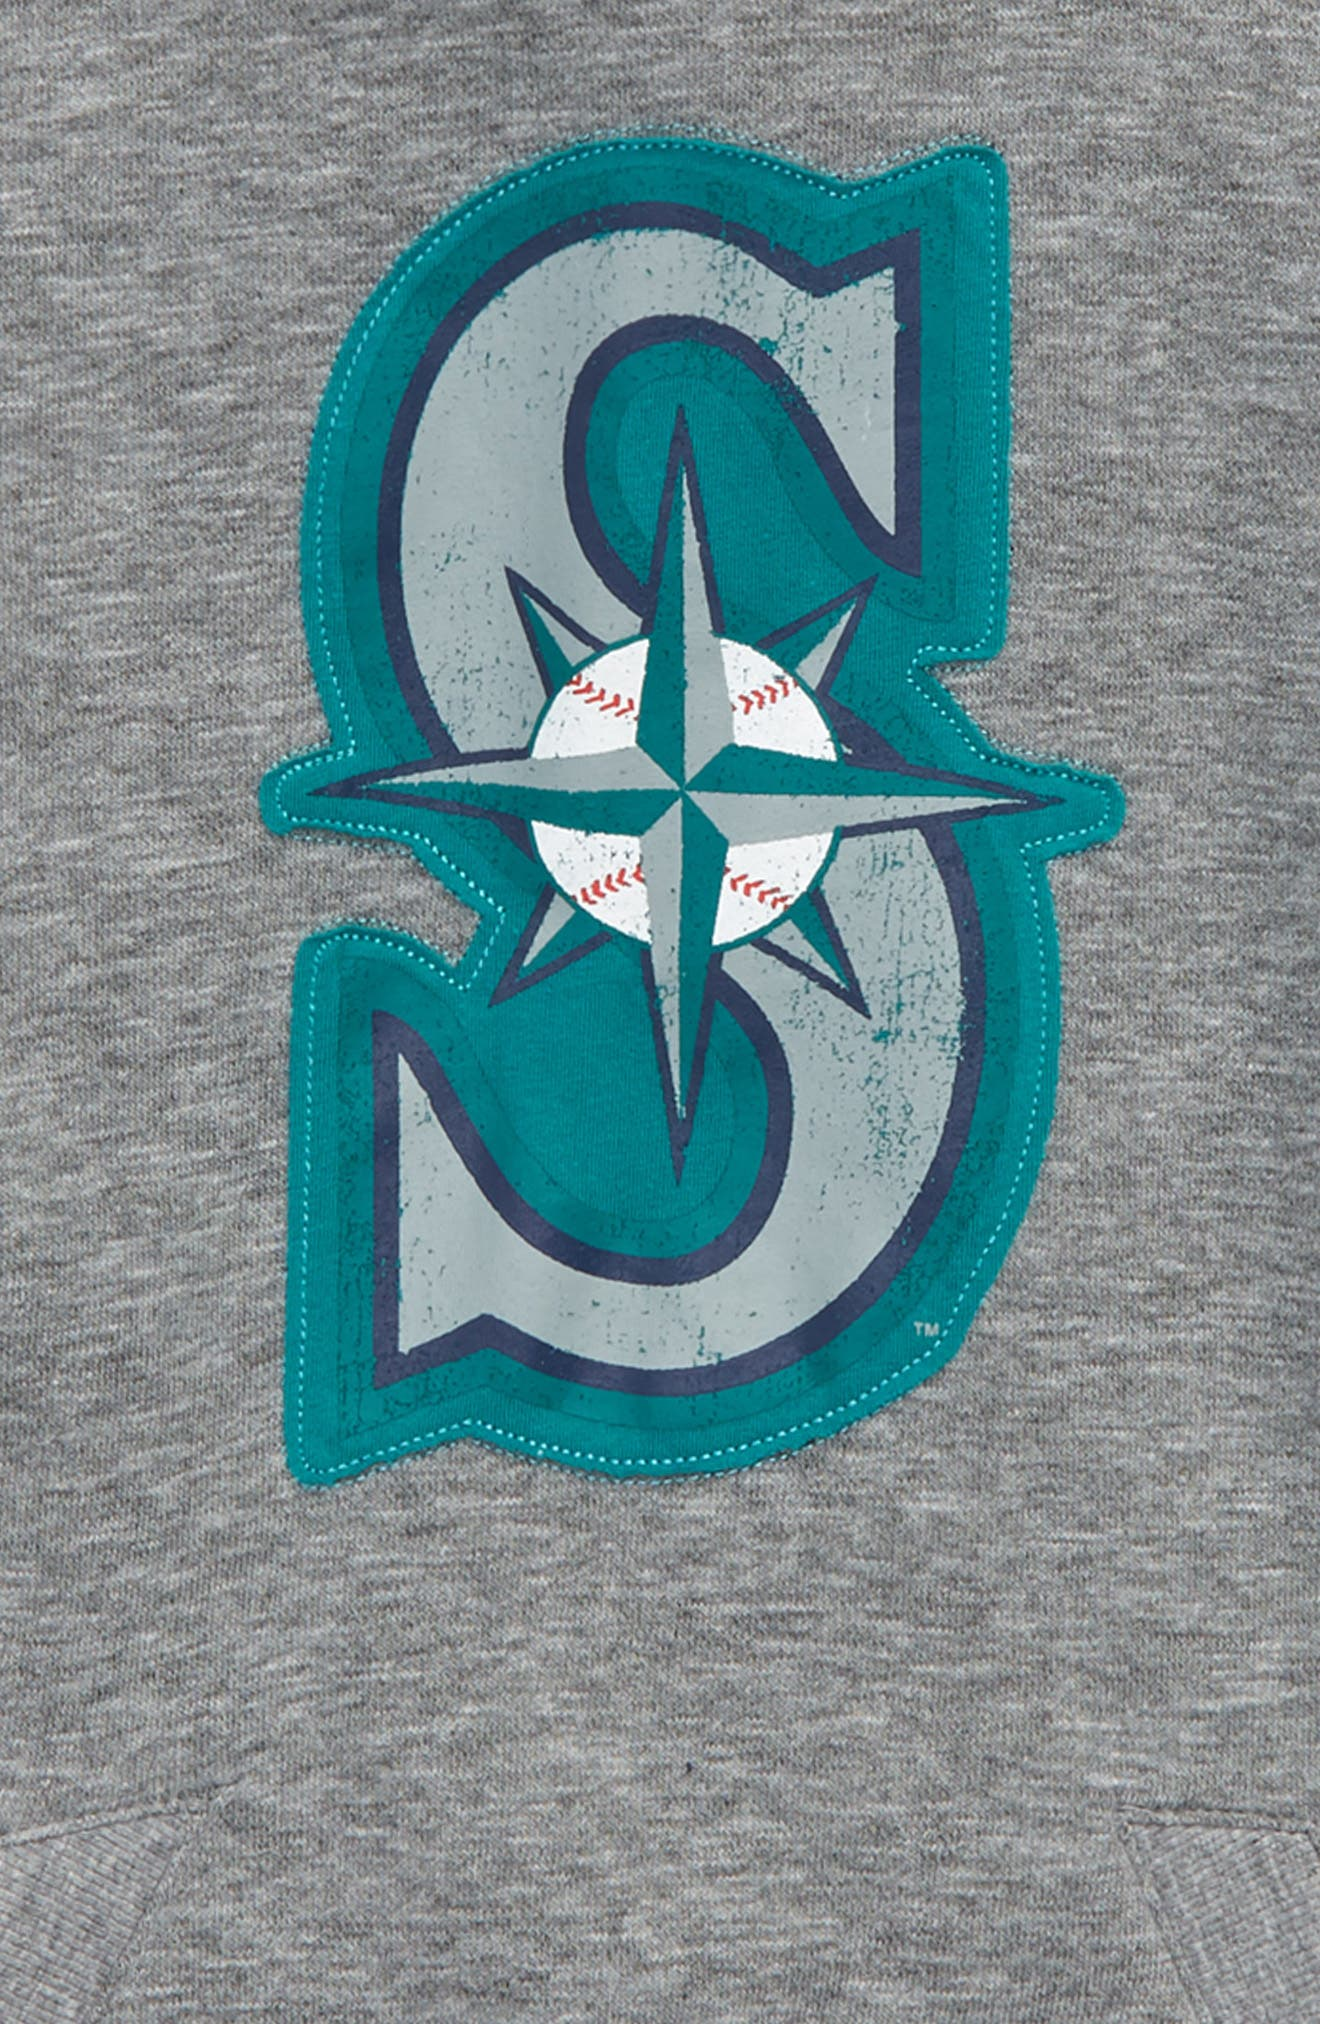 New Beginnings - Seattle Mariners Pullover Hoodie,                             Alternate thumbnail 2, color,